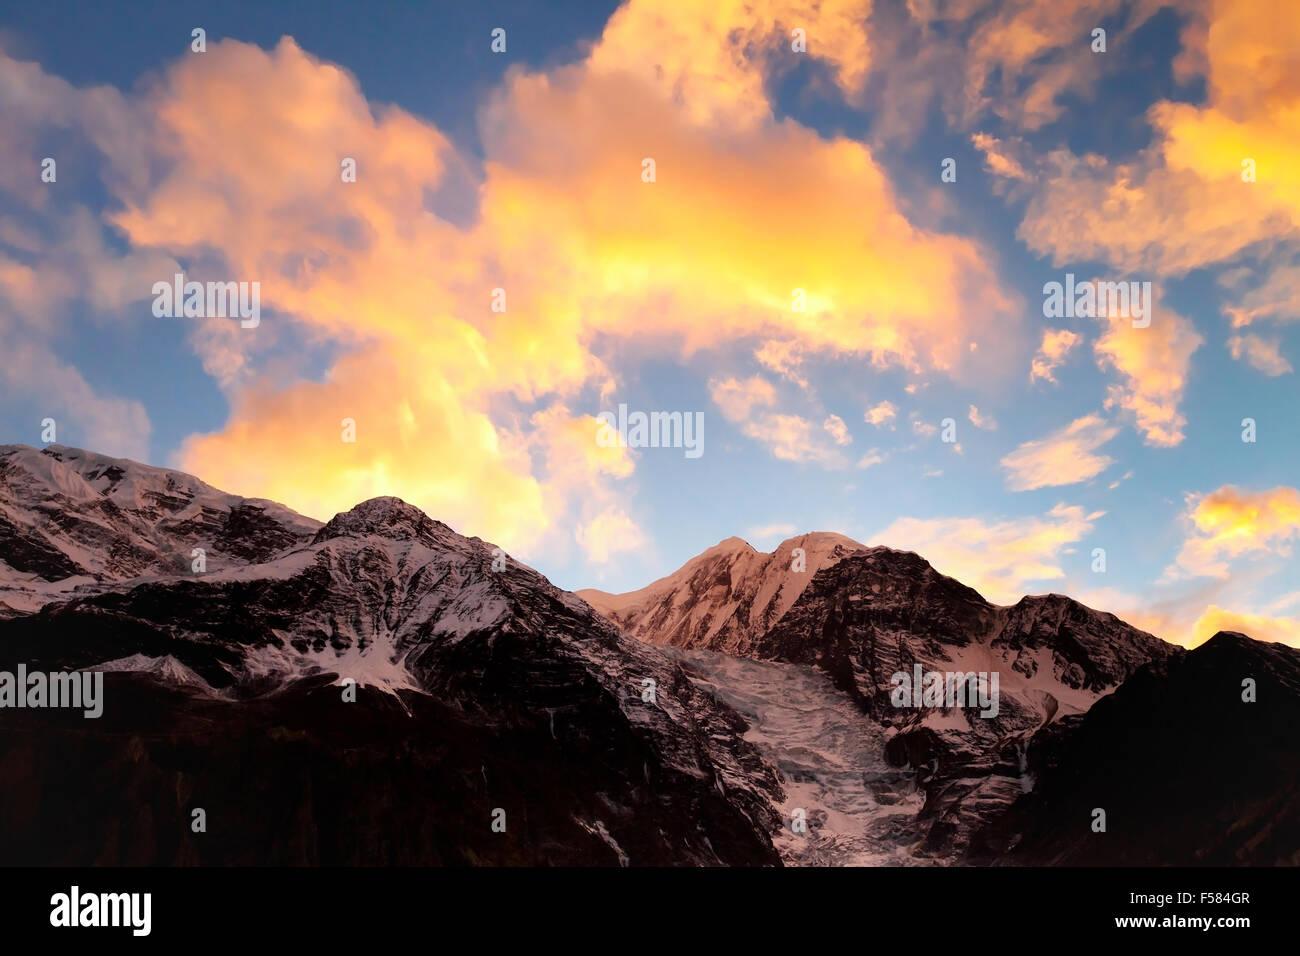 Himalaya mountains at sunset - Stock Image